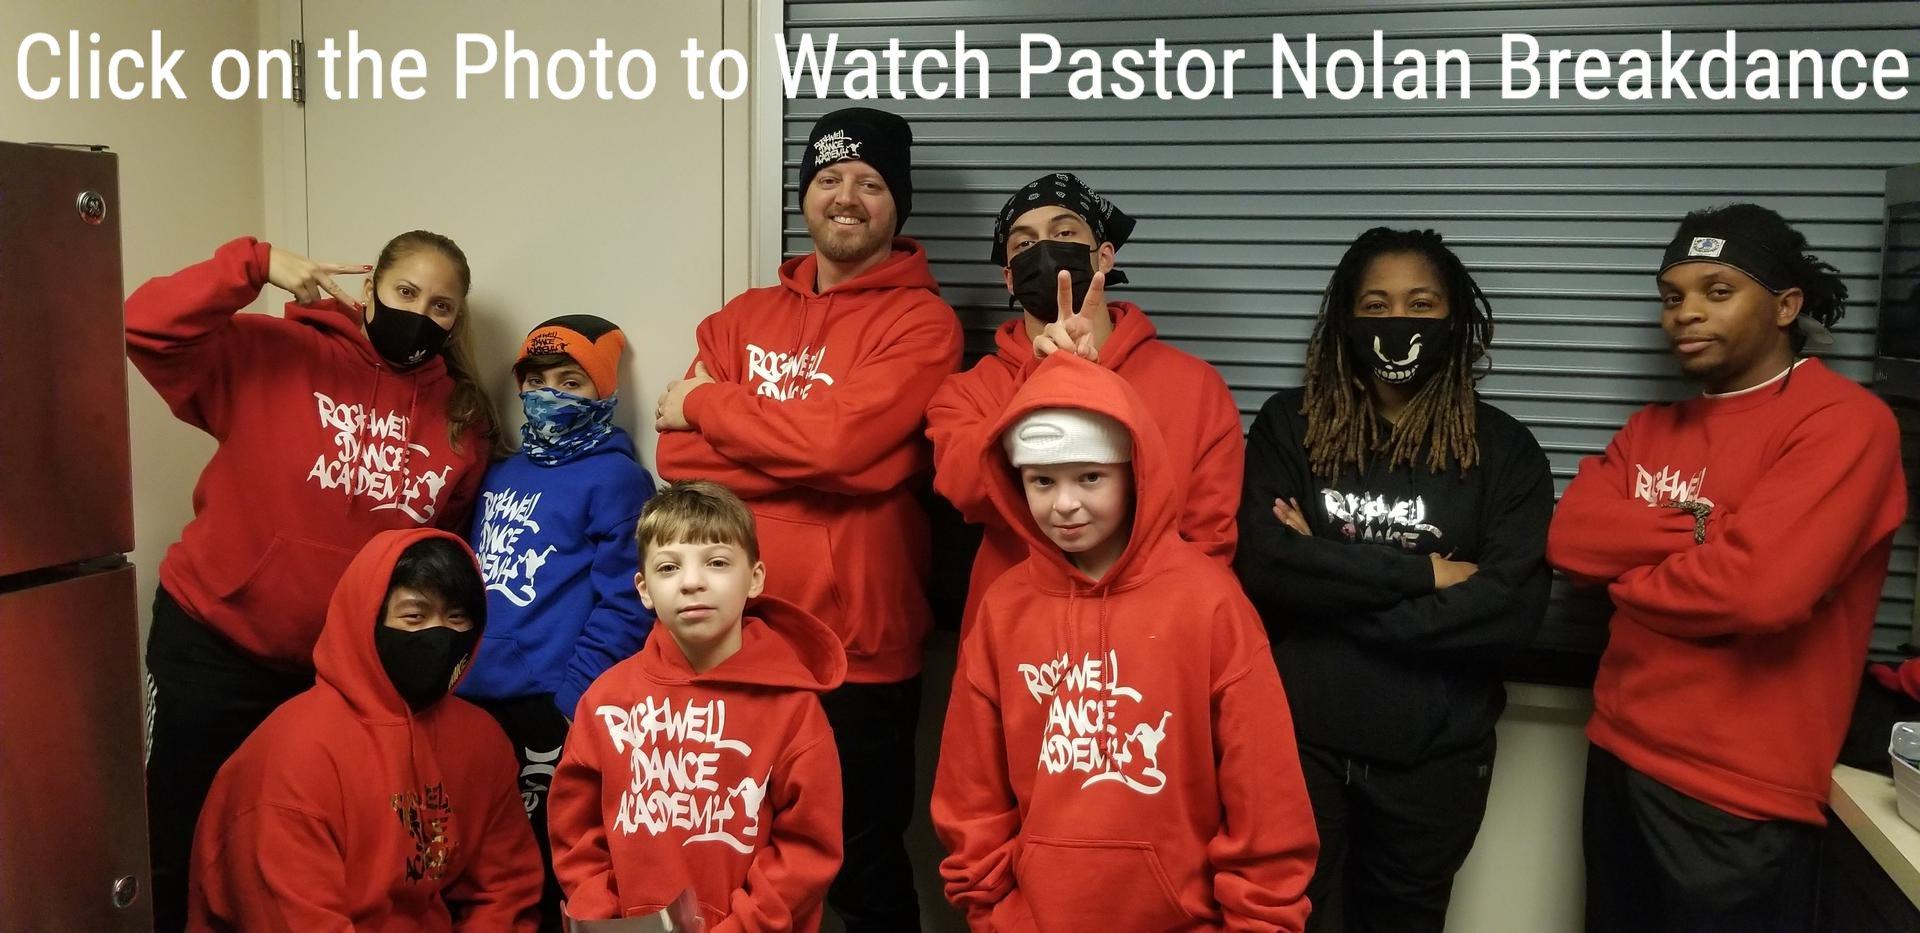 Rockwell Dance Academy & Cornerstone Prep Campus Pastor